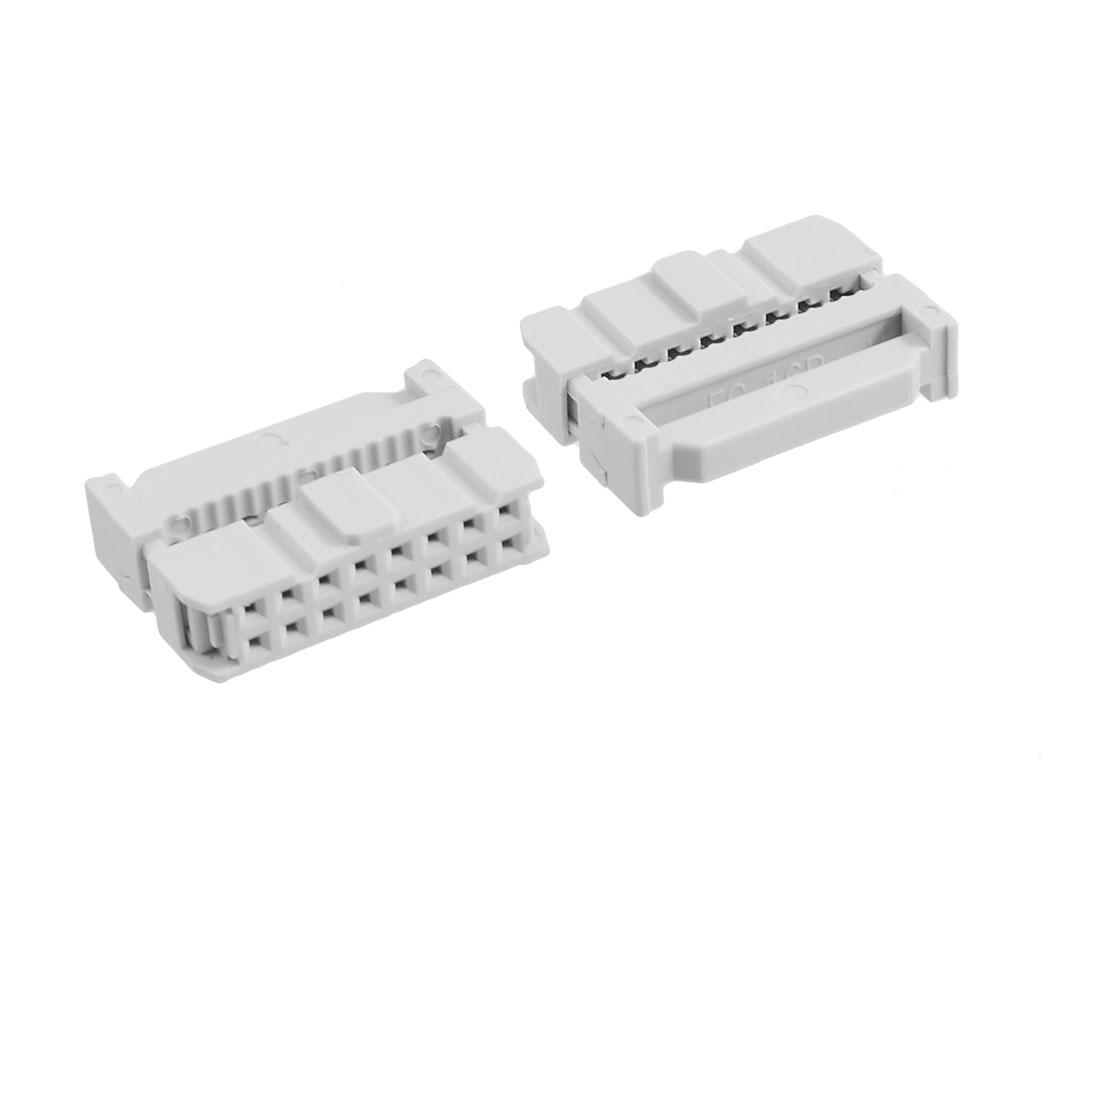 "10 Pcs 0.1"" 2.54mm 16 Pin 14P Female IDC Socket Plug Flat Cable Connector"